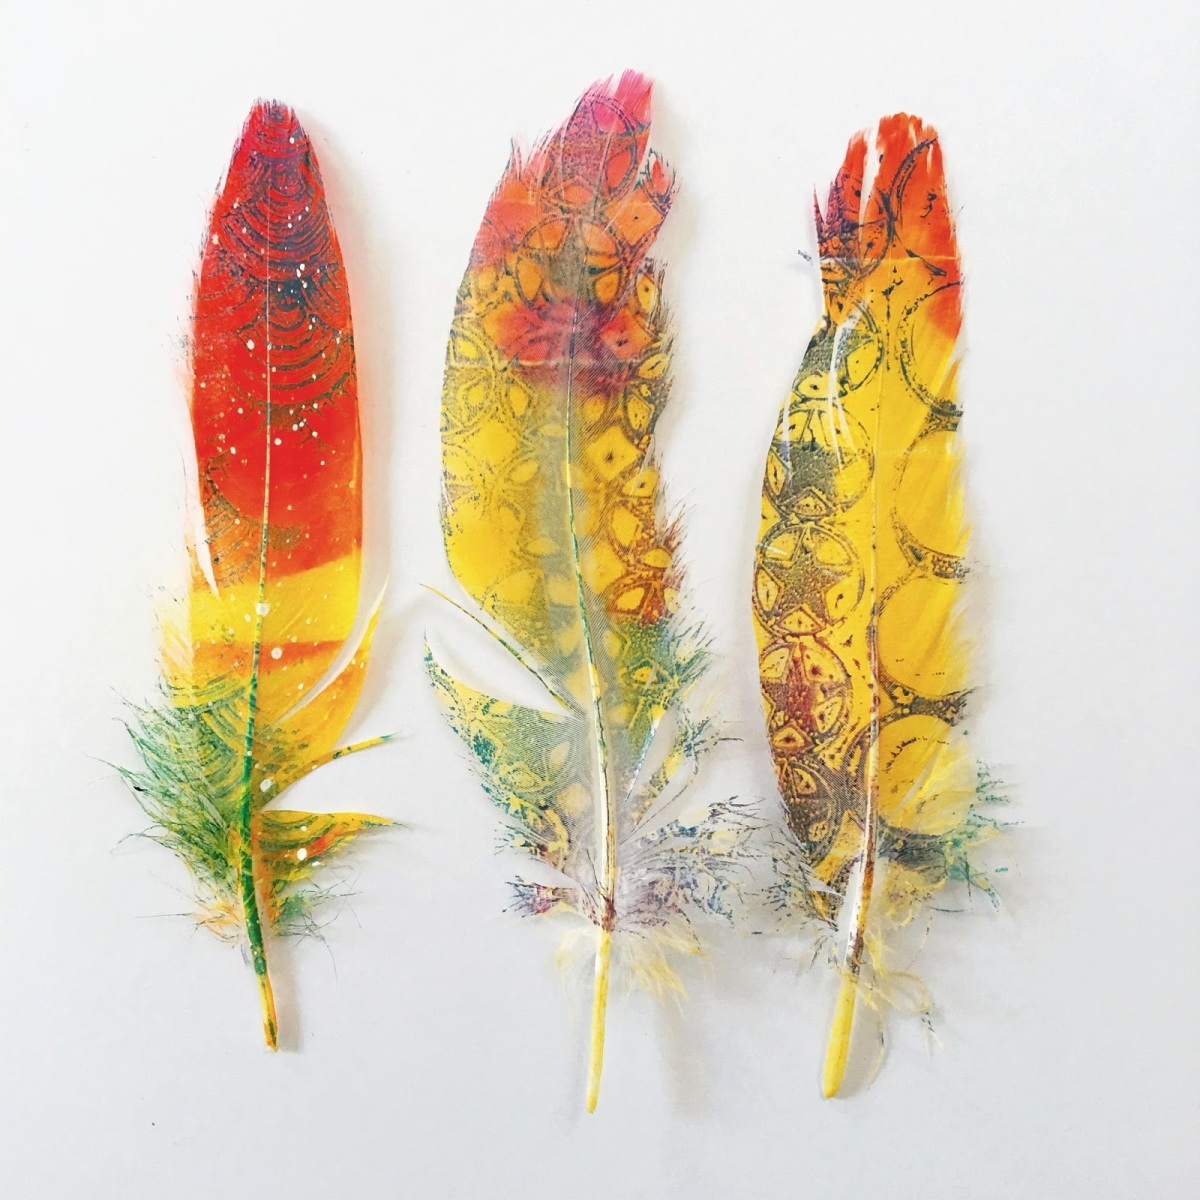 Gelli printed feathers - birgit koopsen.18